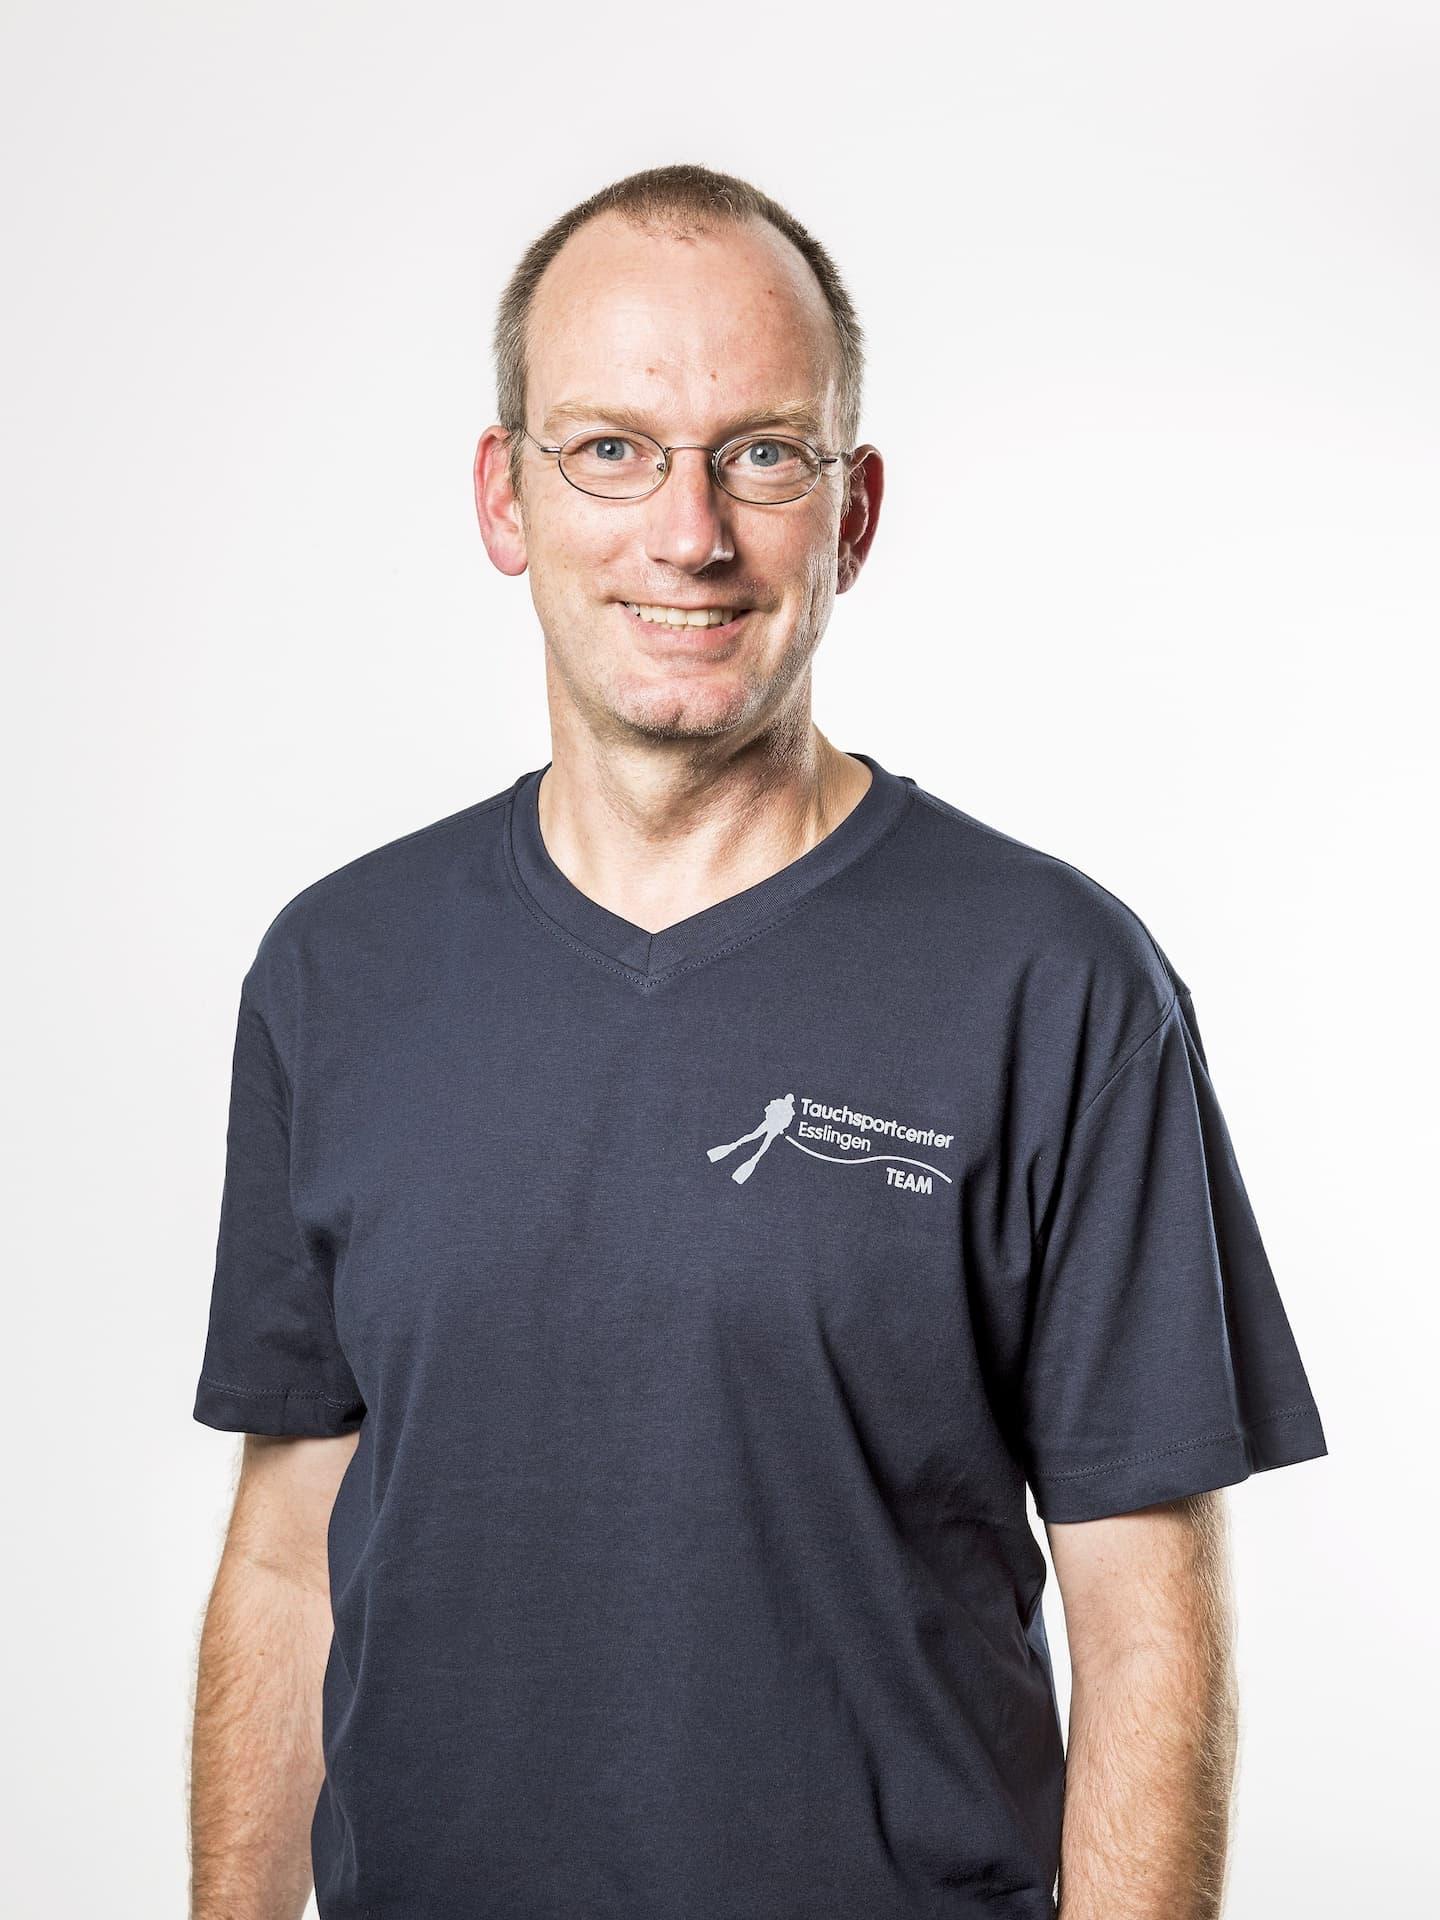 Mario Ahlmann